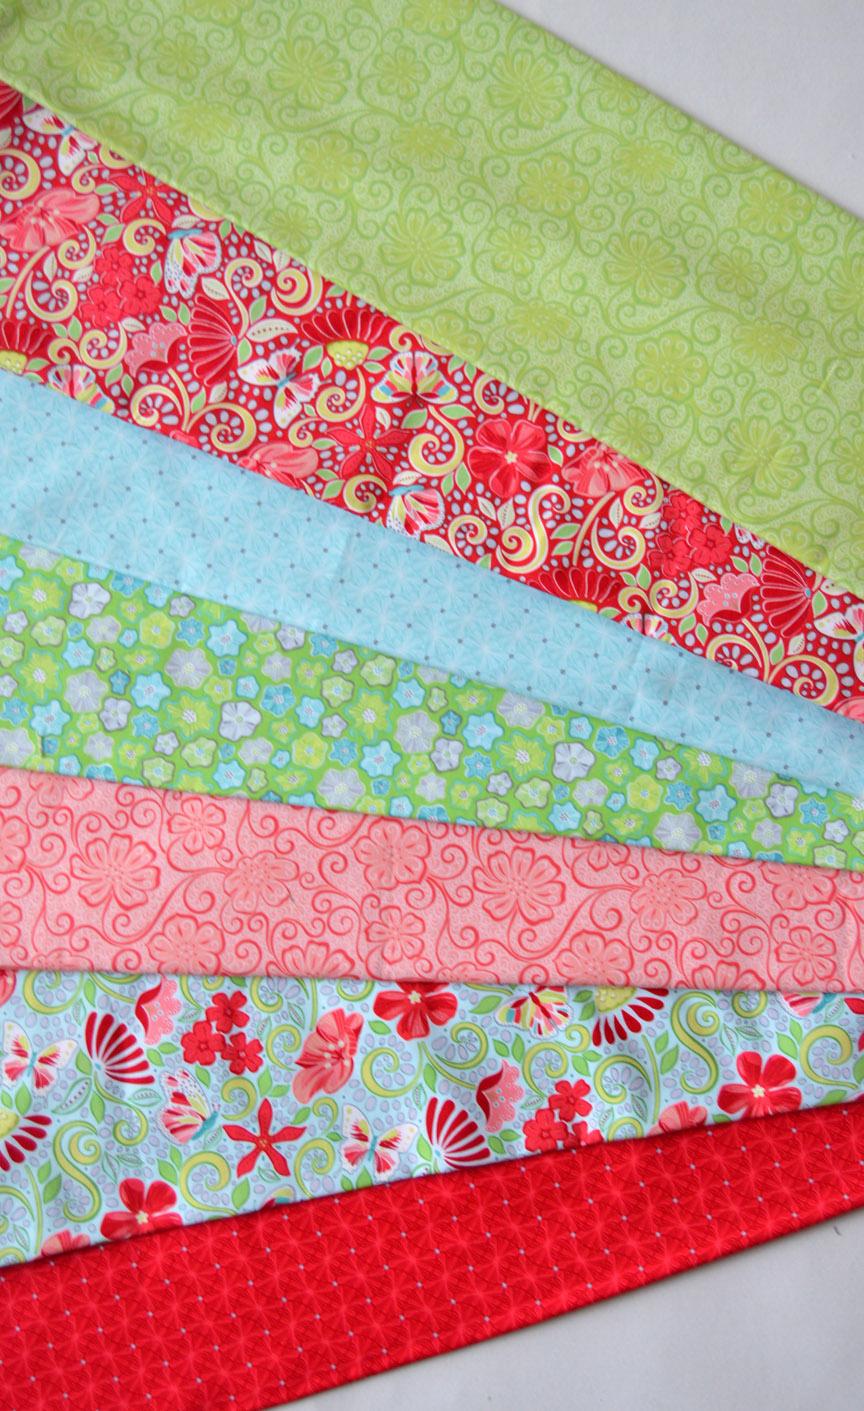 Sew In Love With Fabric Introducing Amanda Murphy S